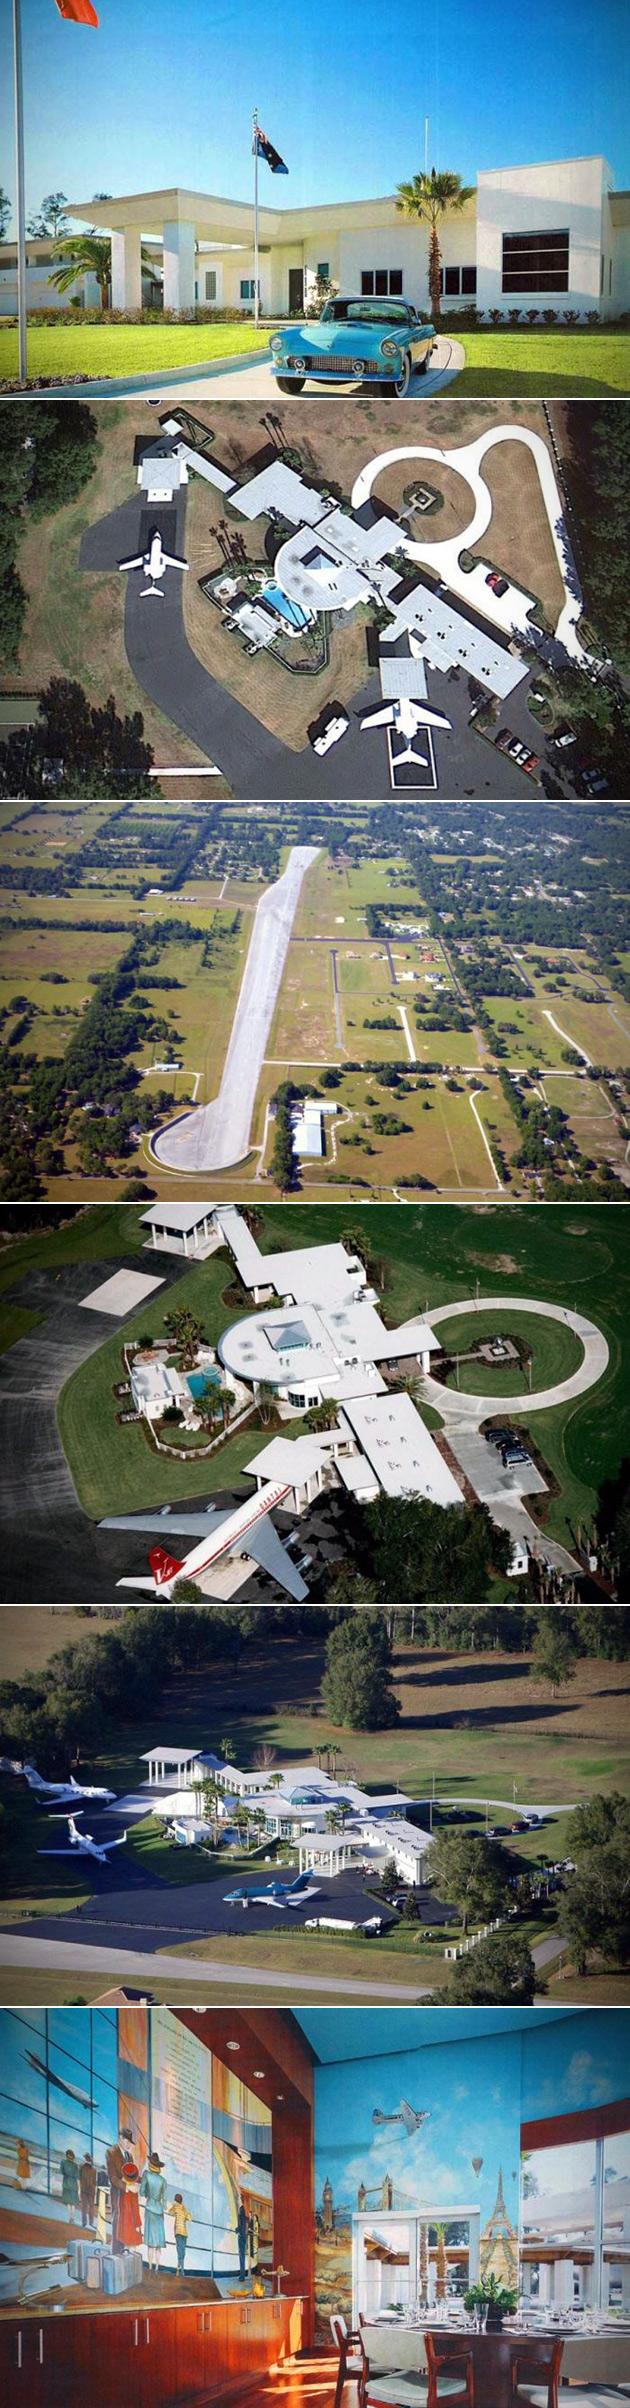 John travolta pilot certifications